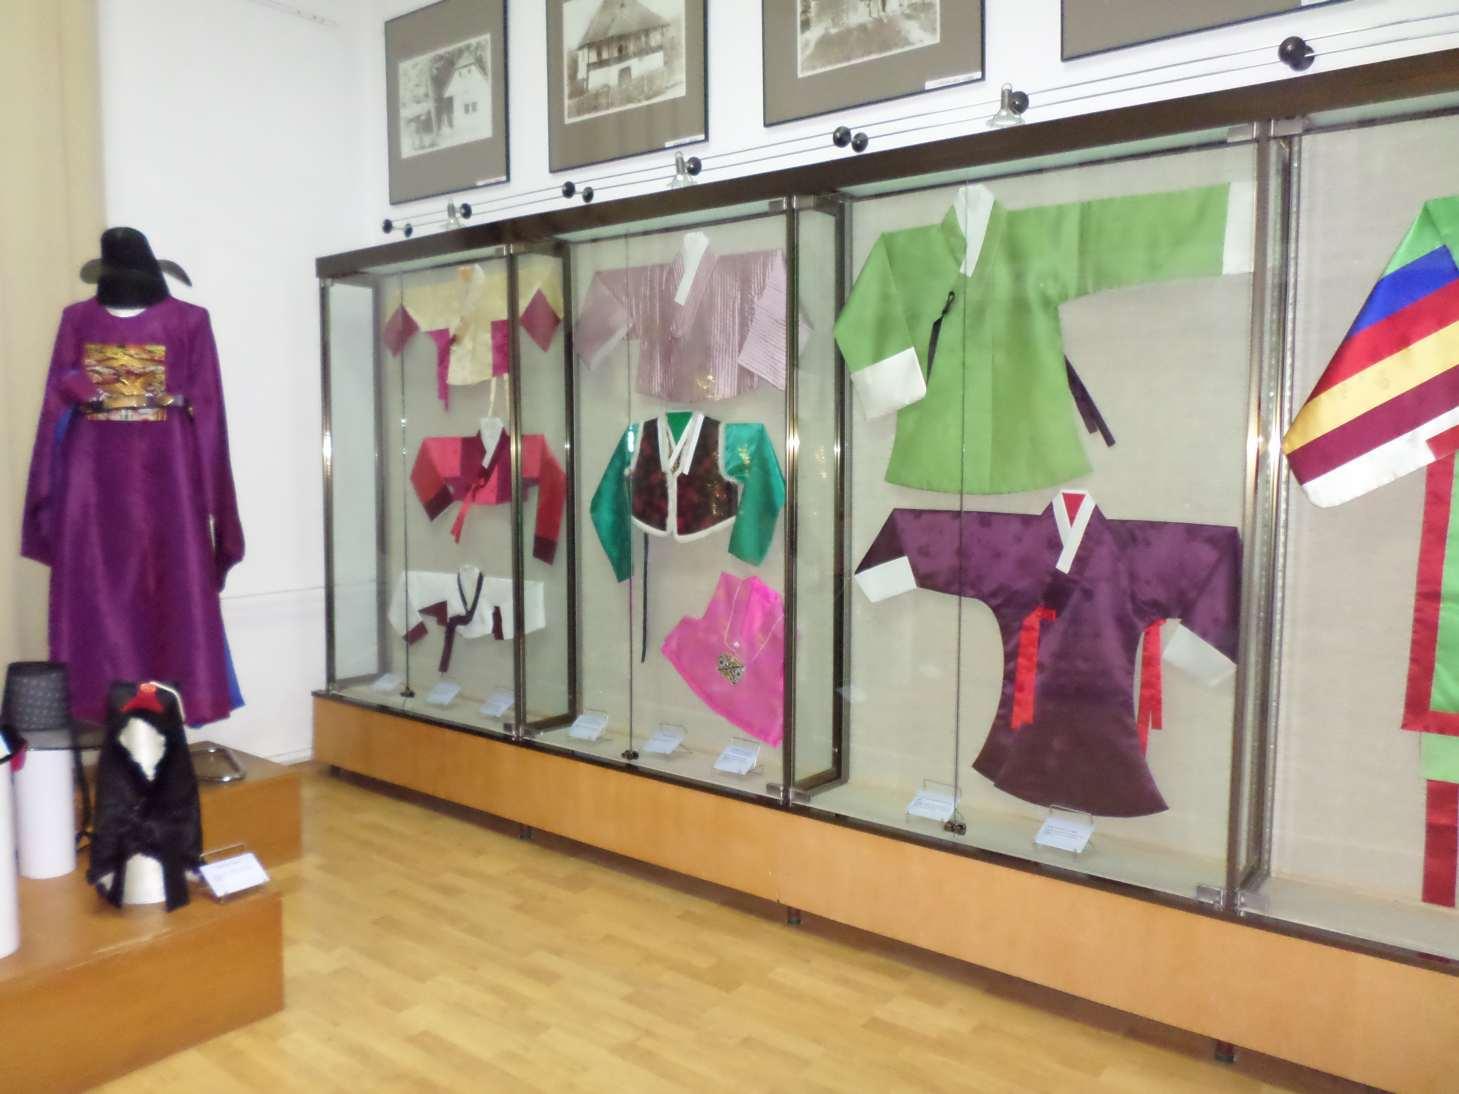 expozitia temporara costumul traditional coreean muzeul de arta populara constanta poze